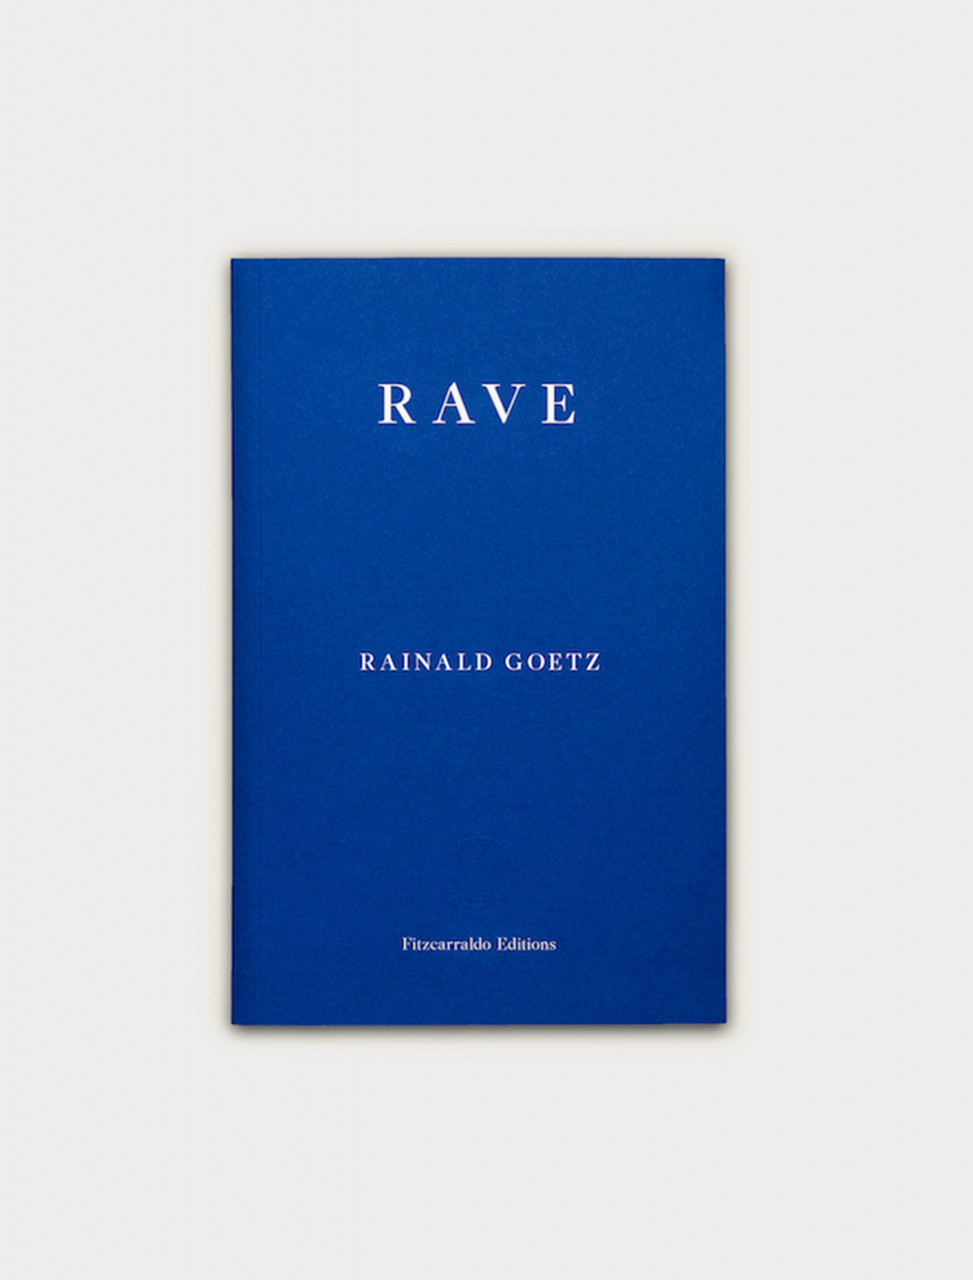 9781913097196 Fitzcarraldo Editions RAVE - Rainald Goetz